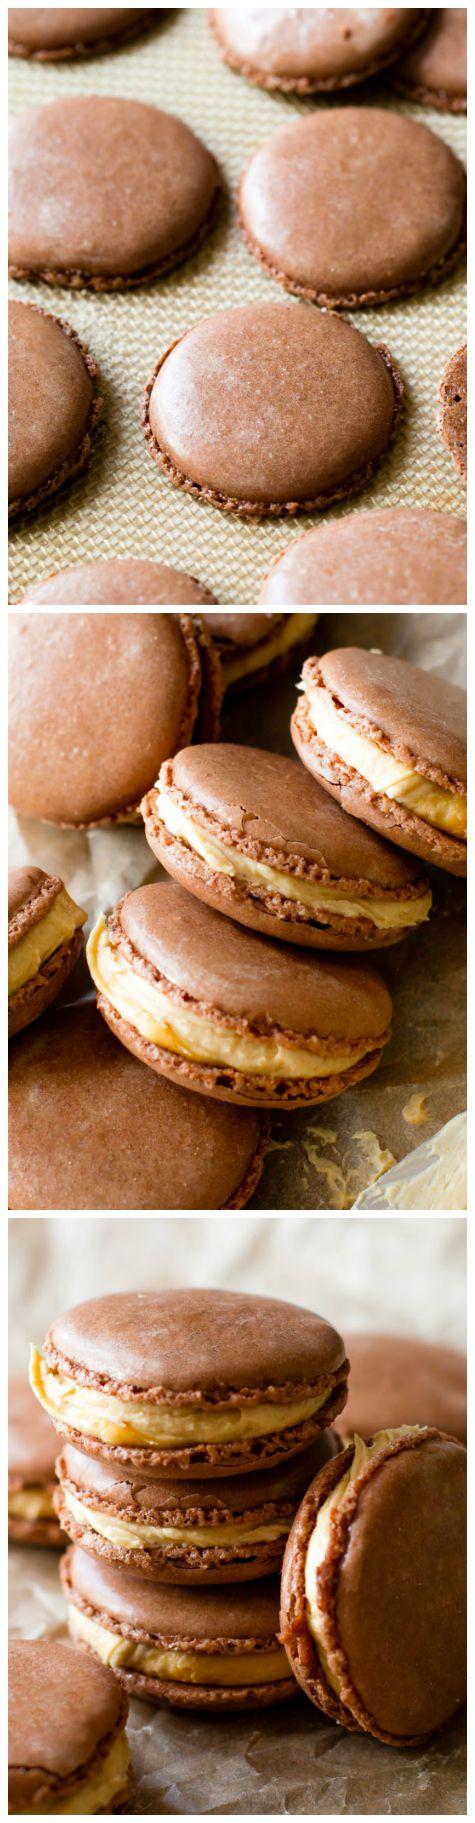 Chocolate Peanut Butter Macarons - Sallys Baking Addiction